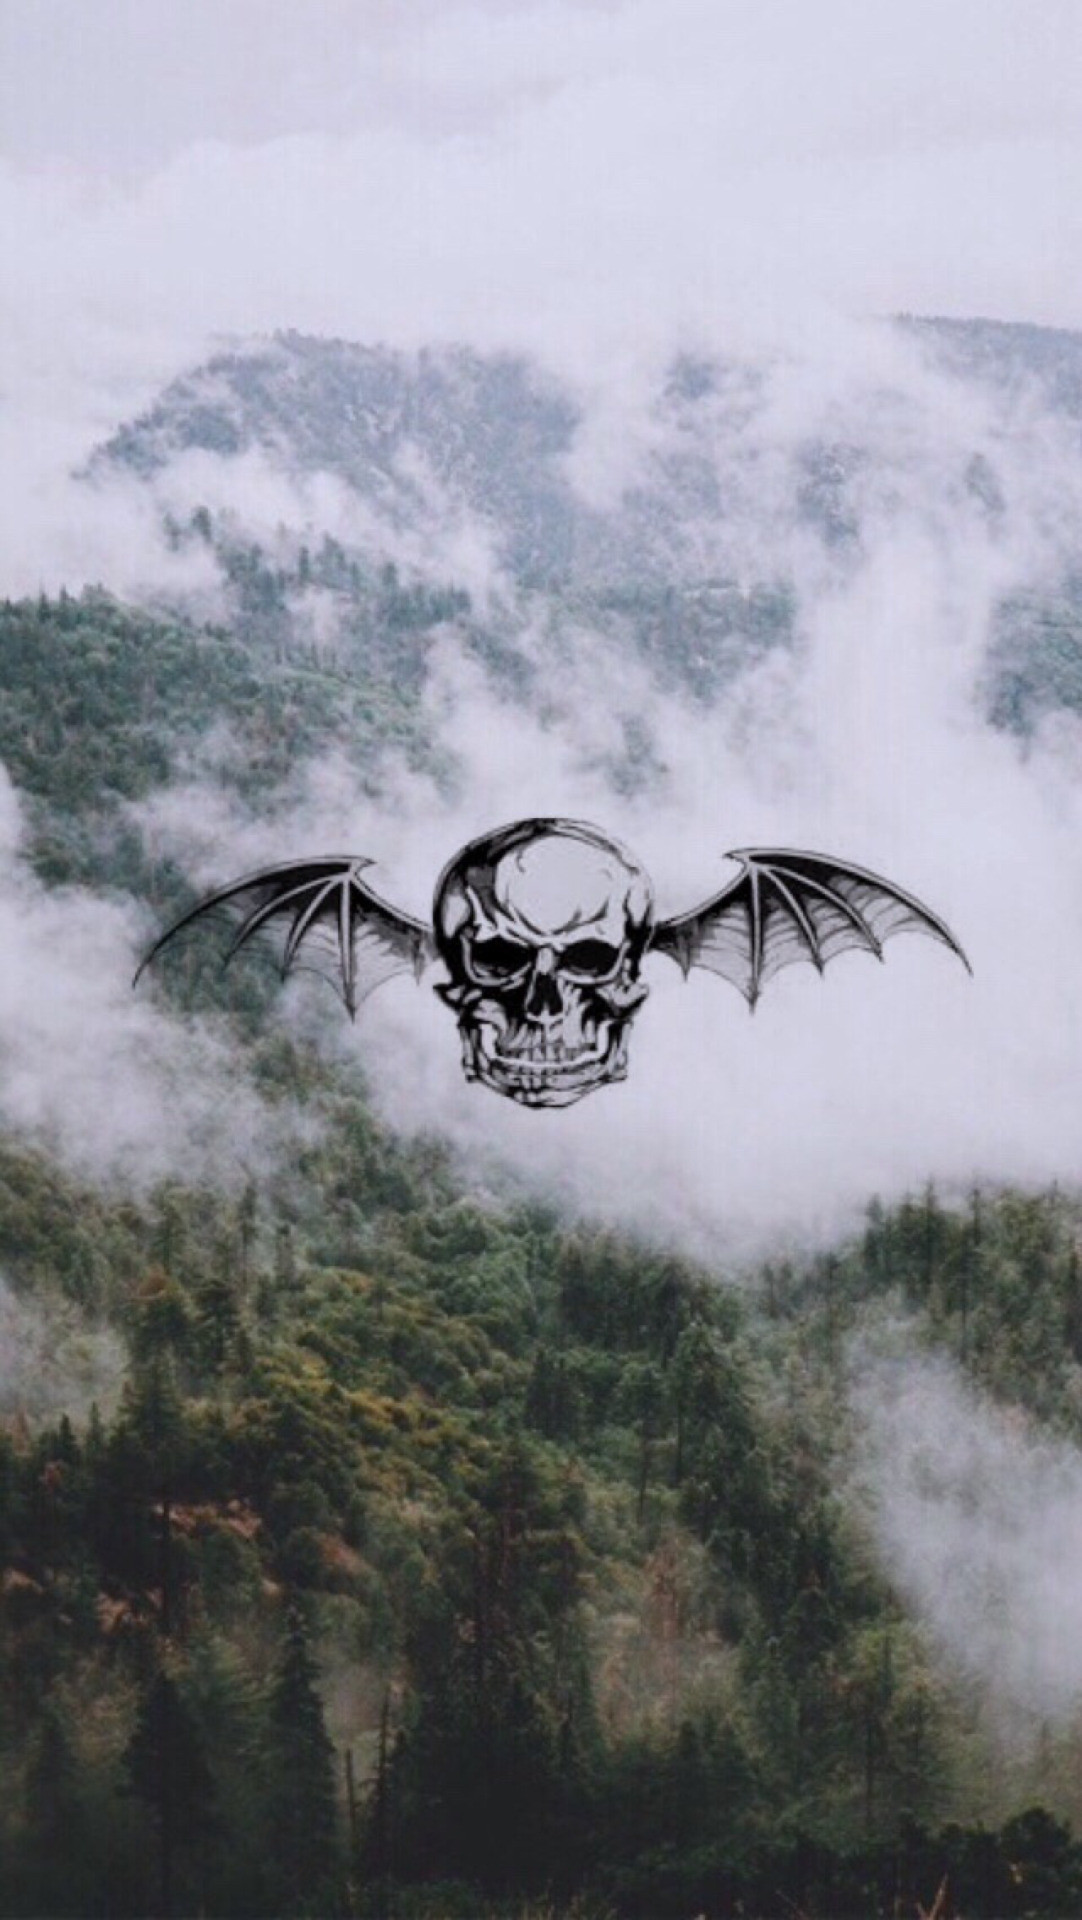 #avengedsevenfold. pretty epic deathbat wallpaper, picture found on tumblr:  hqlockscreens